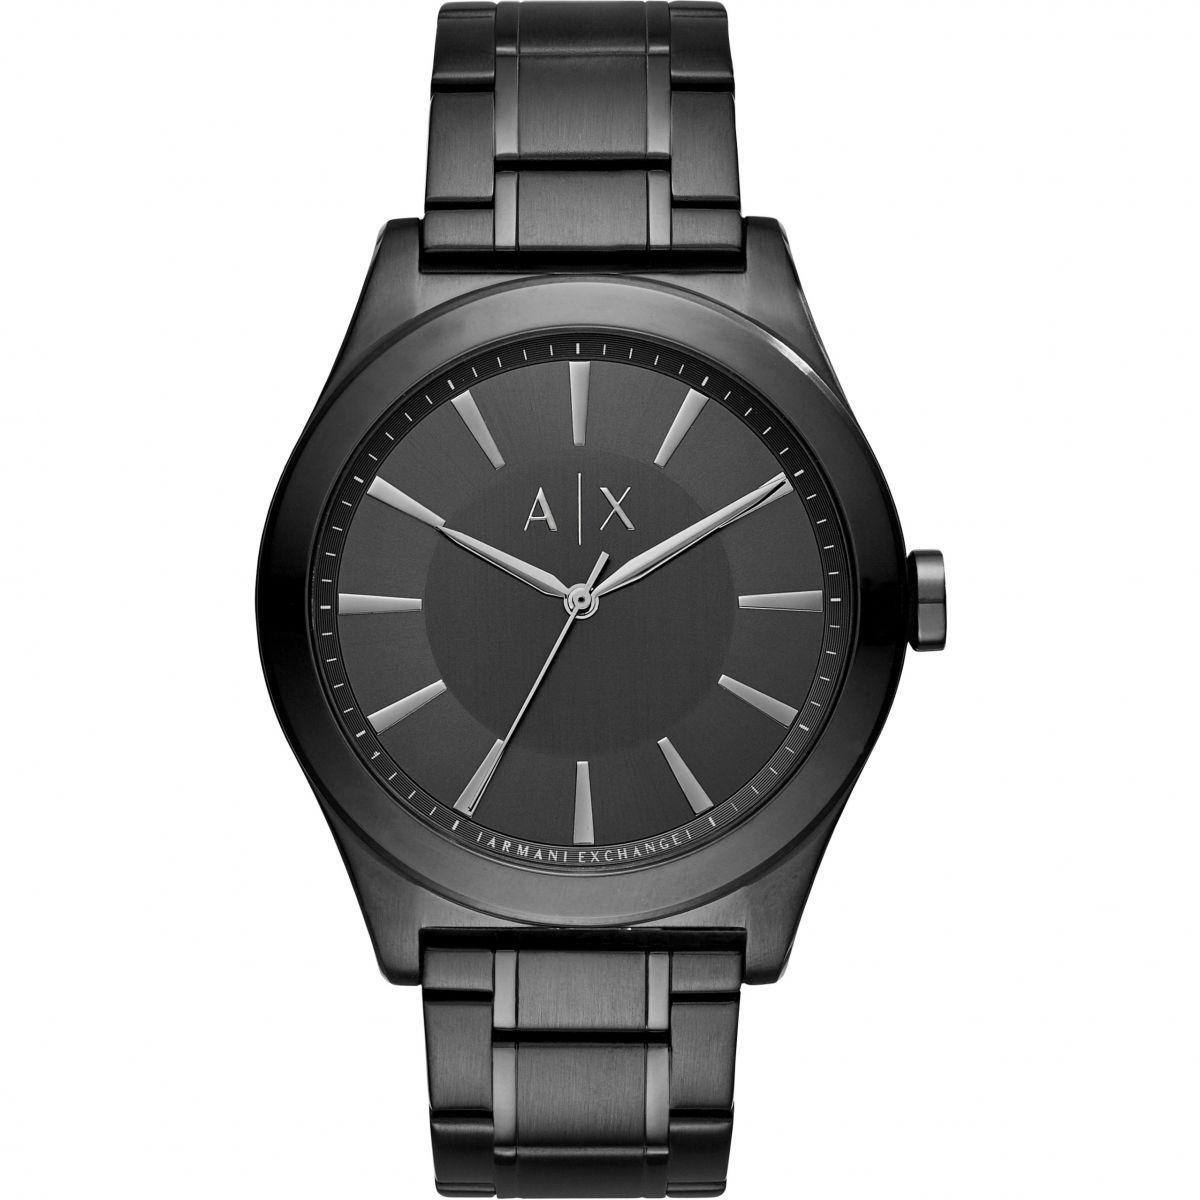 Gents Armani Exchange Watch (AX2322) | WatchShop.com™